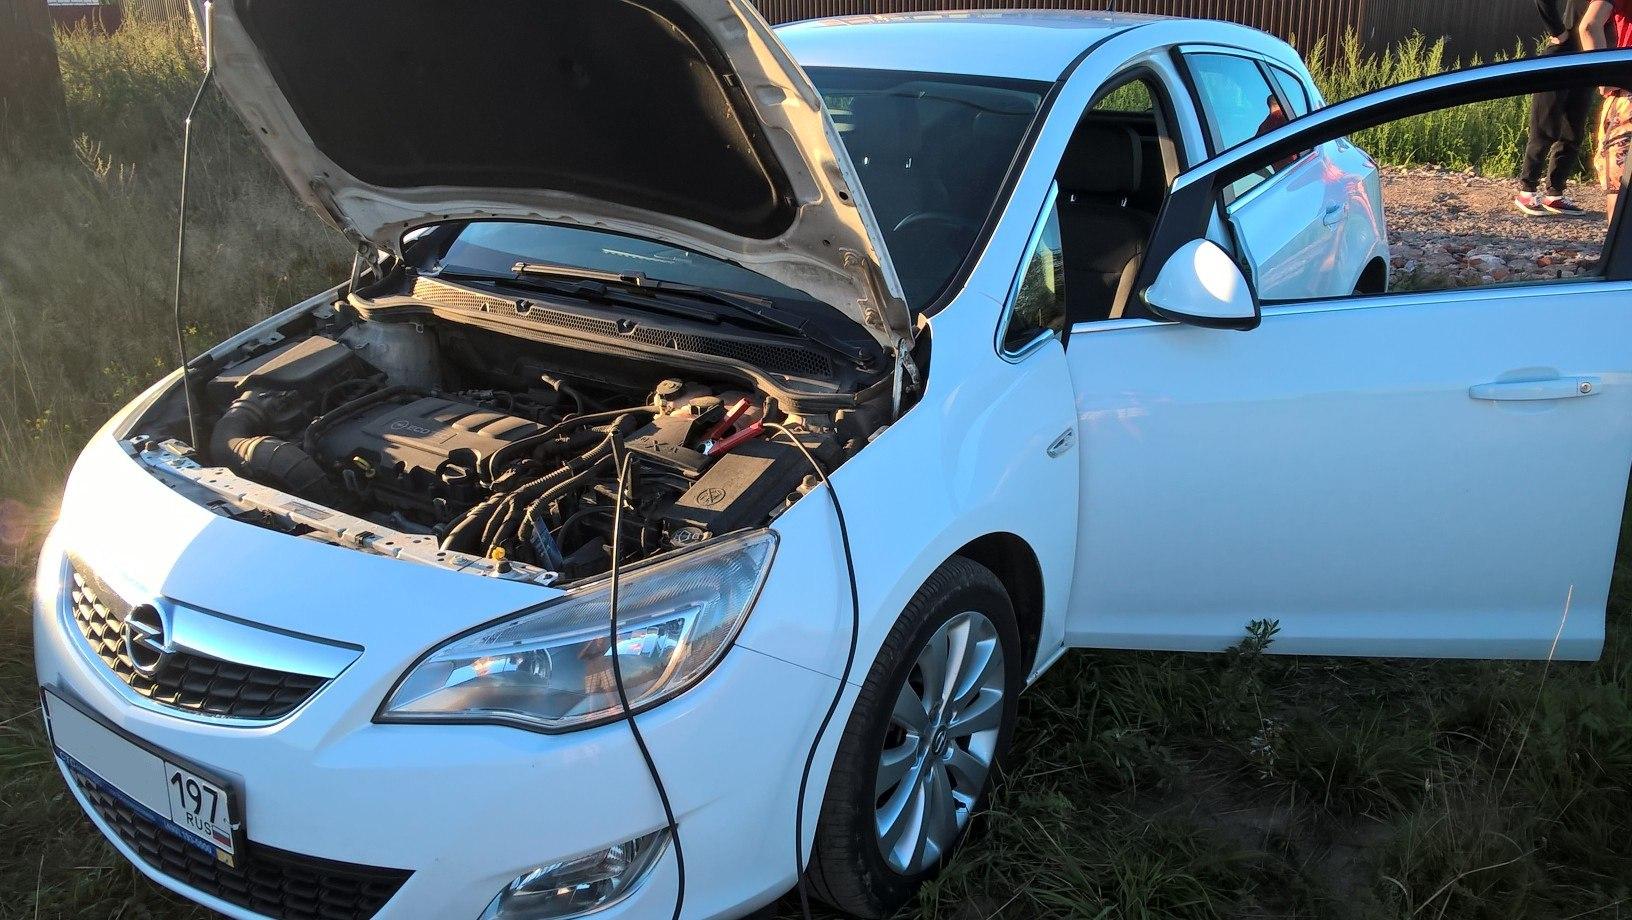 Чип тюнинг Opel Astra J 1.4 турбо